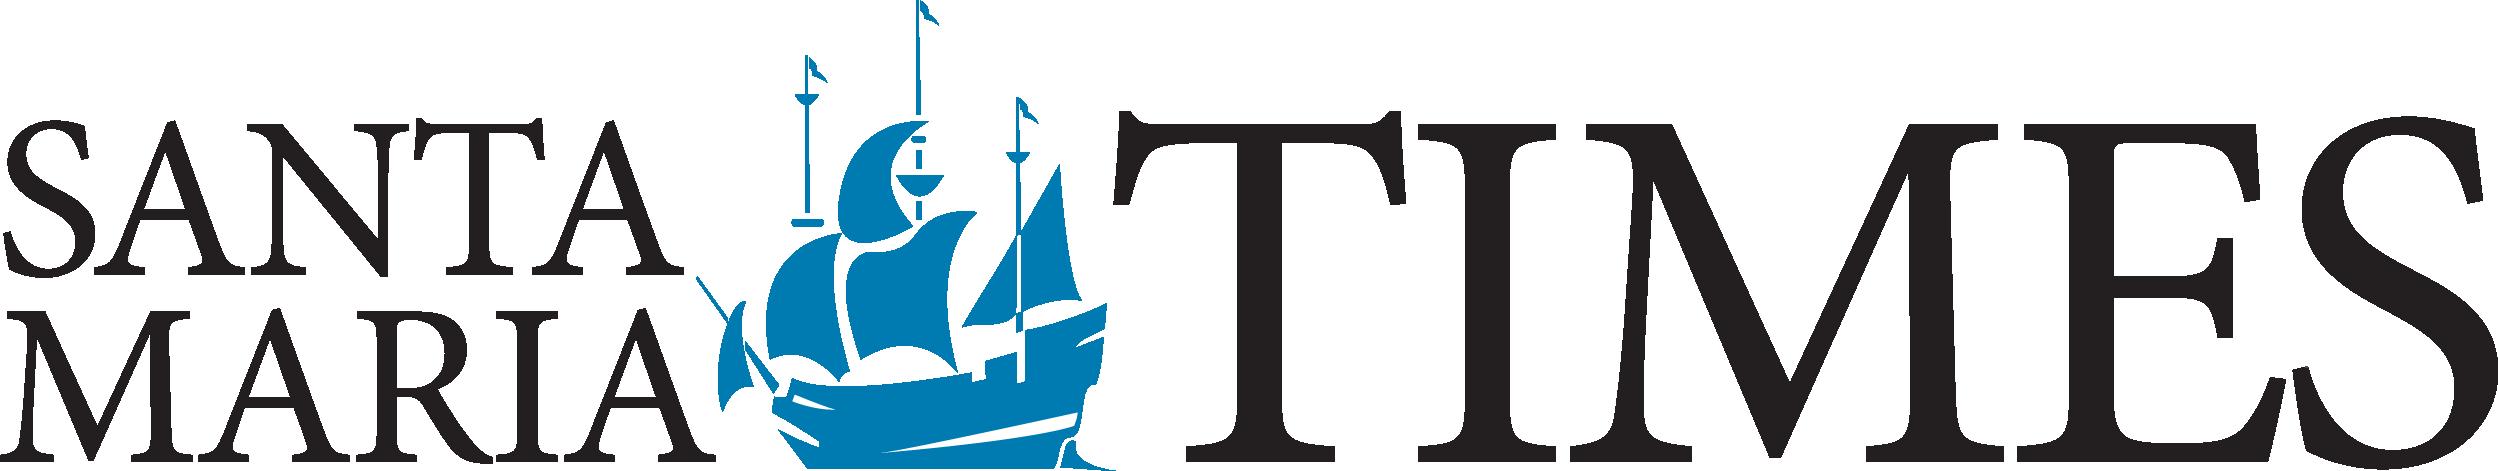 Santa Maria Times - Daily-headlines